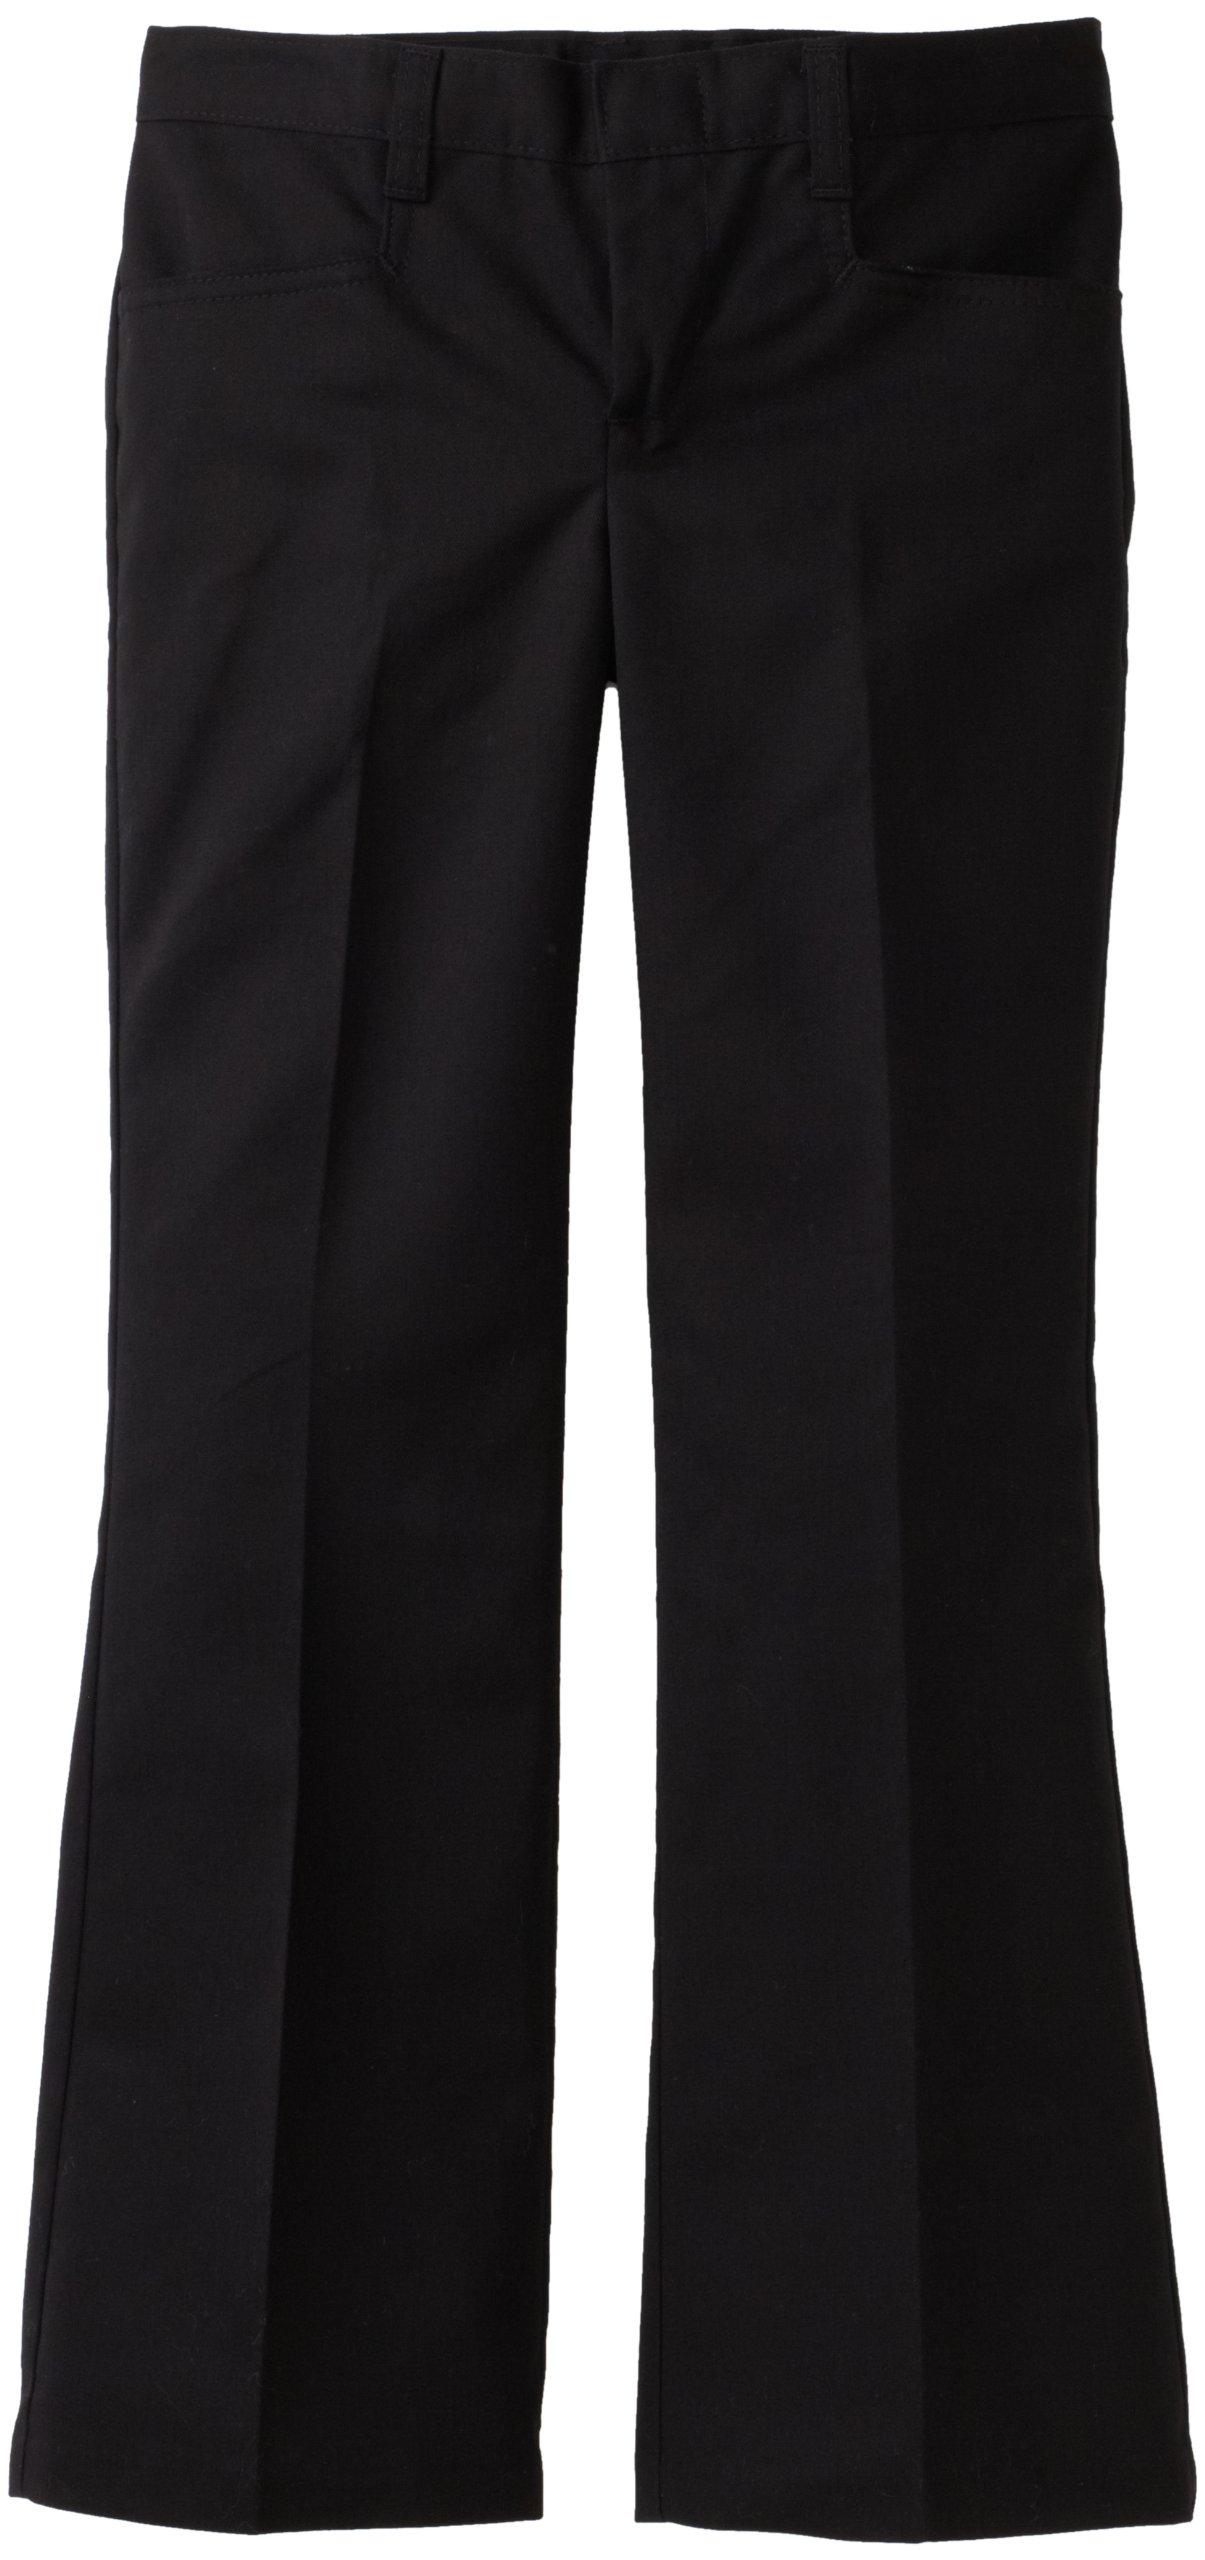 Dickies Big Girls' Flare Bottom Pant, Black, 18 Regular